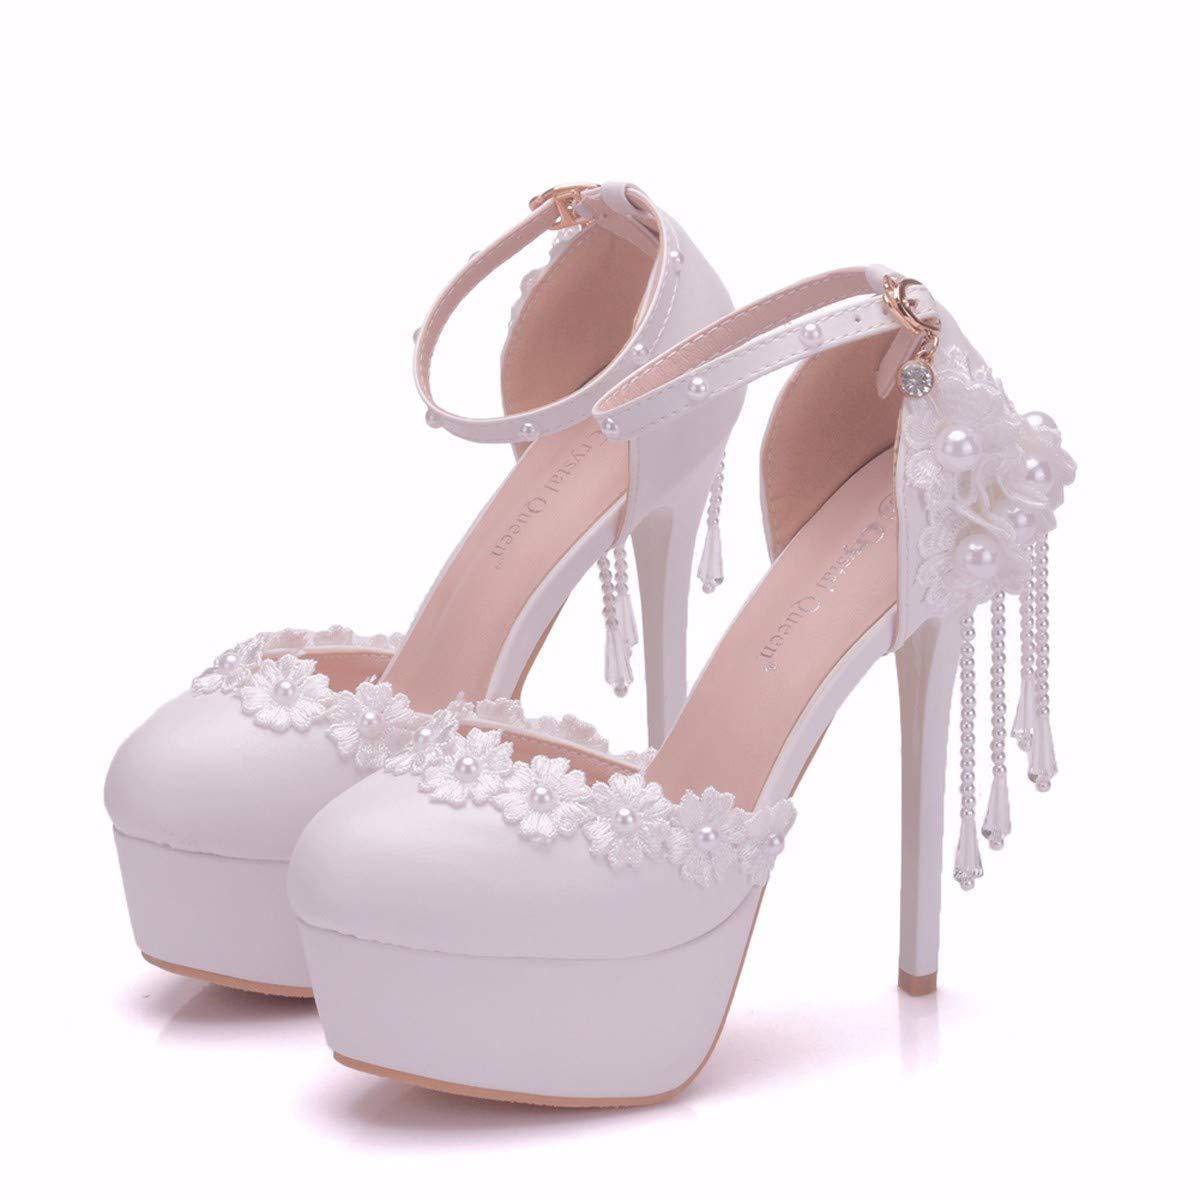 GTVERNH Damenschuhe 14 cm Runden Kopf Wasserdichte Tabelle Hochhackigen Sandalen Perle Perlen Tassel Hochzeit Hochzeit Schuhe Spitze Schuhe.